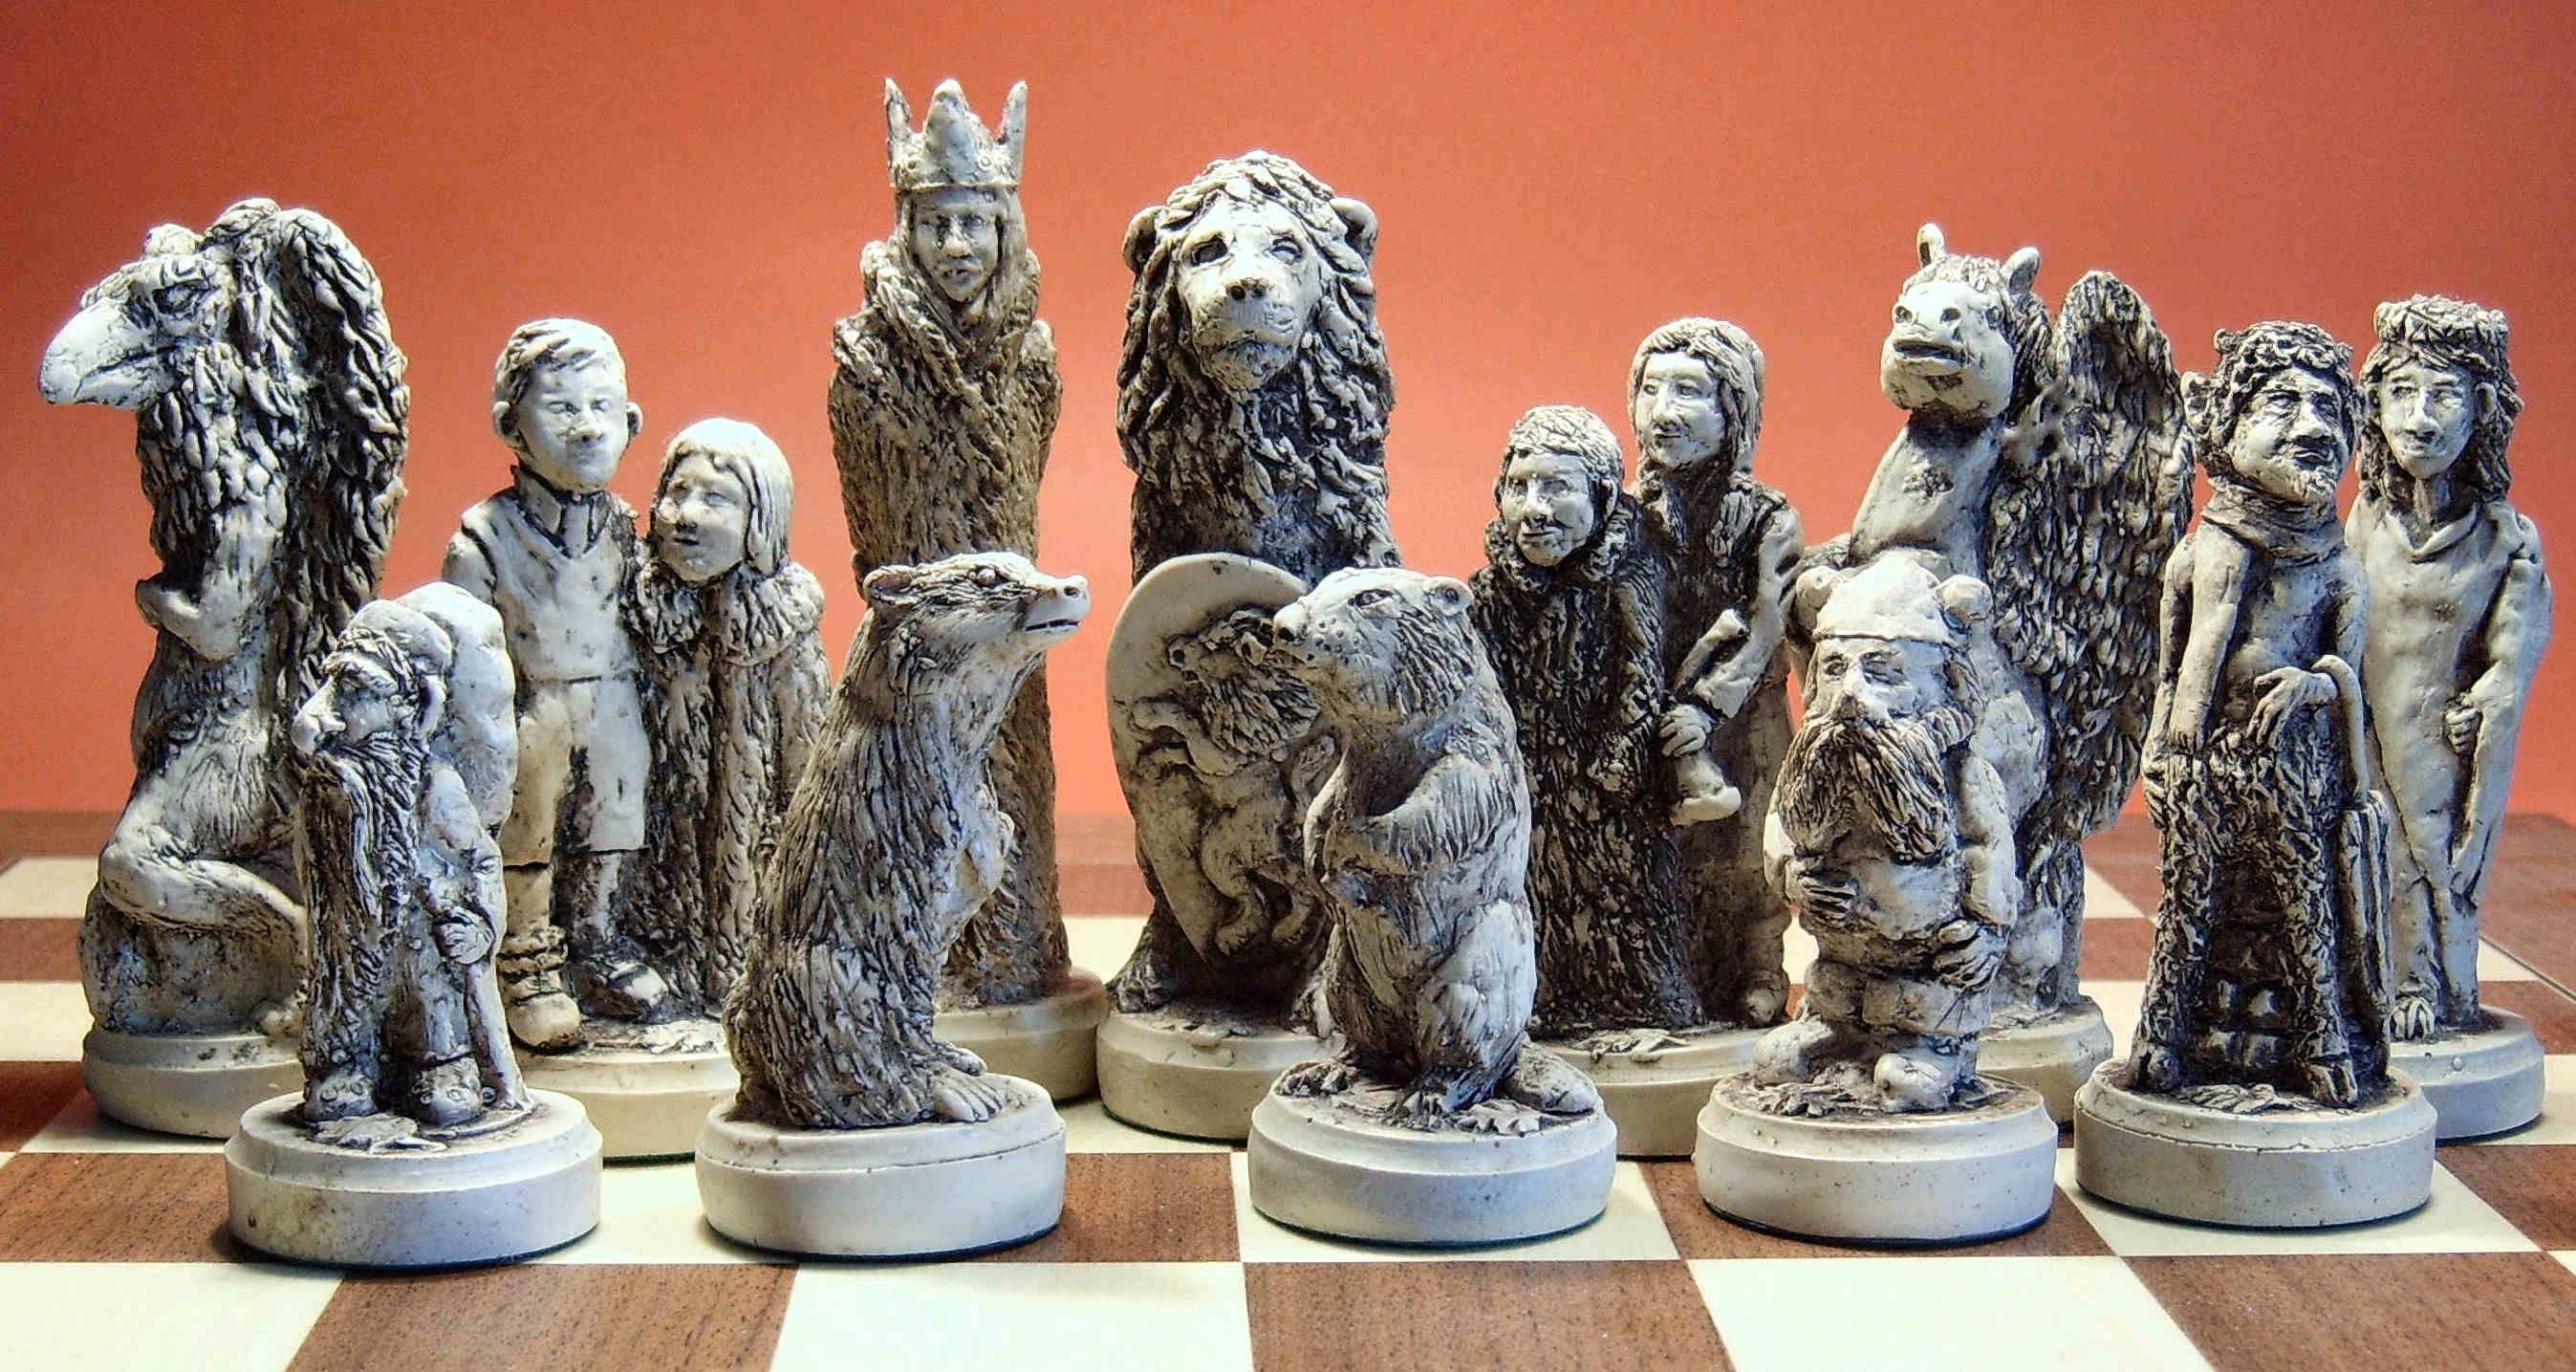 Unique Chess Set Unique Chess Pieces  Chess Nuts  Chess Moulds & More  Crafts